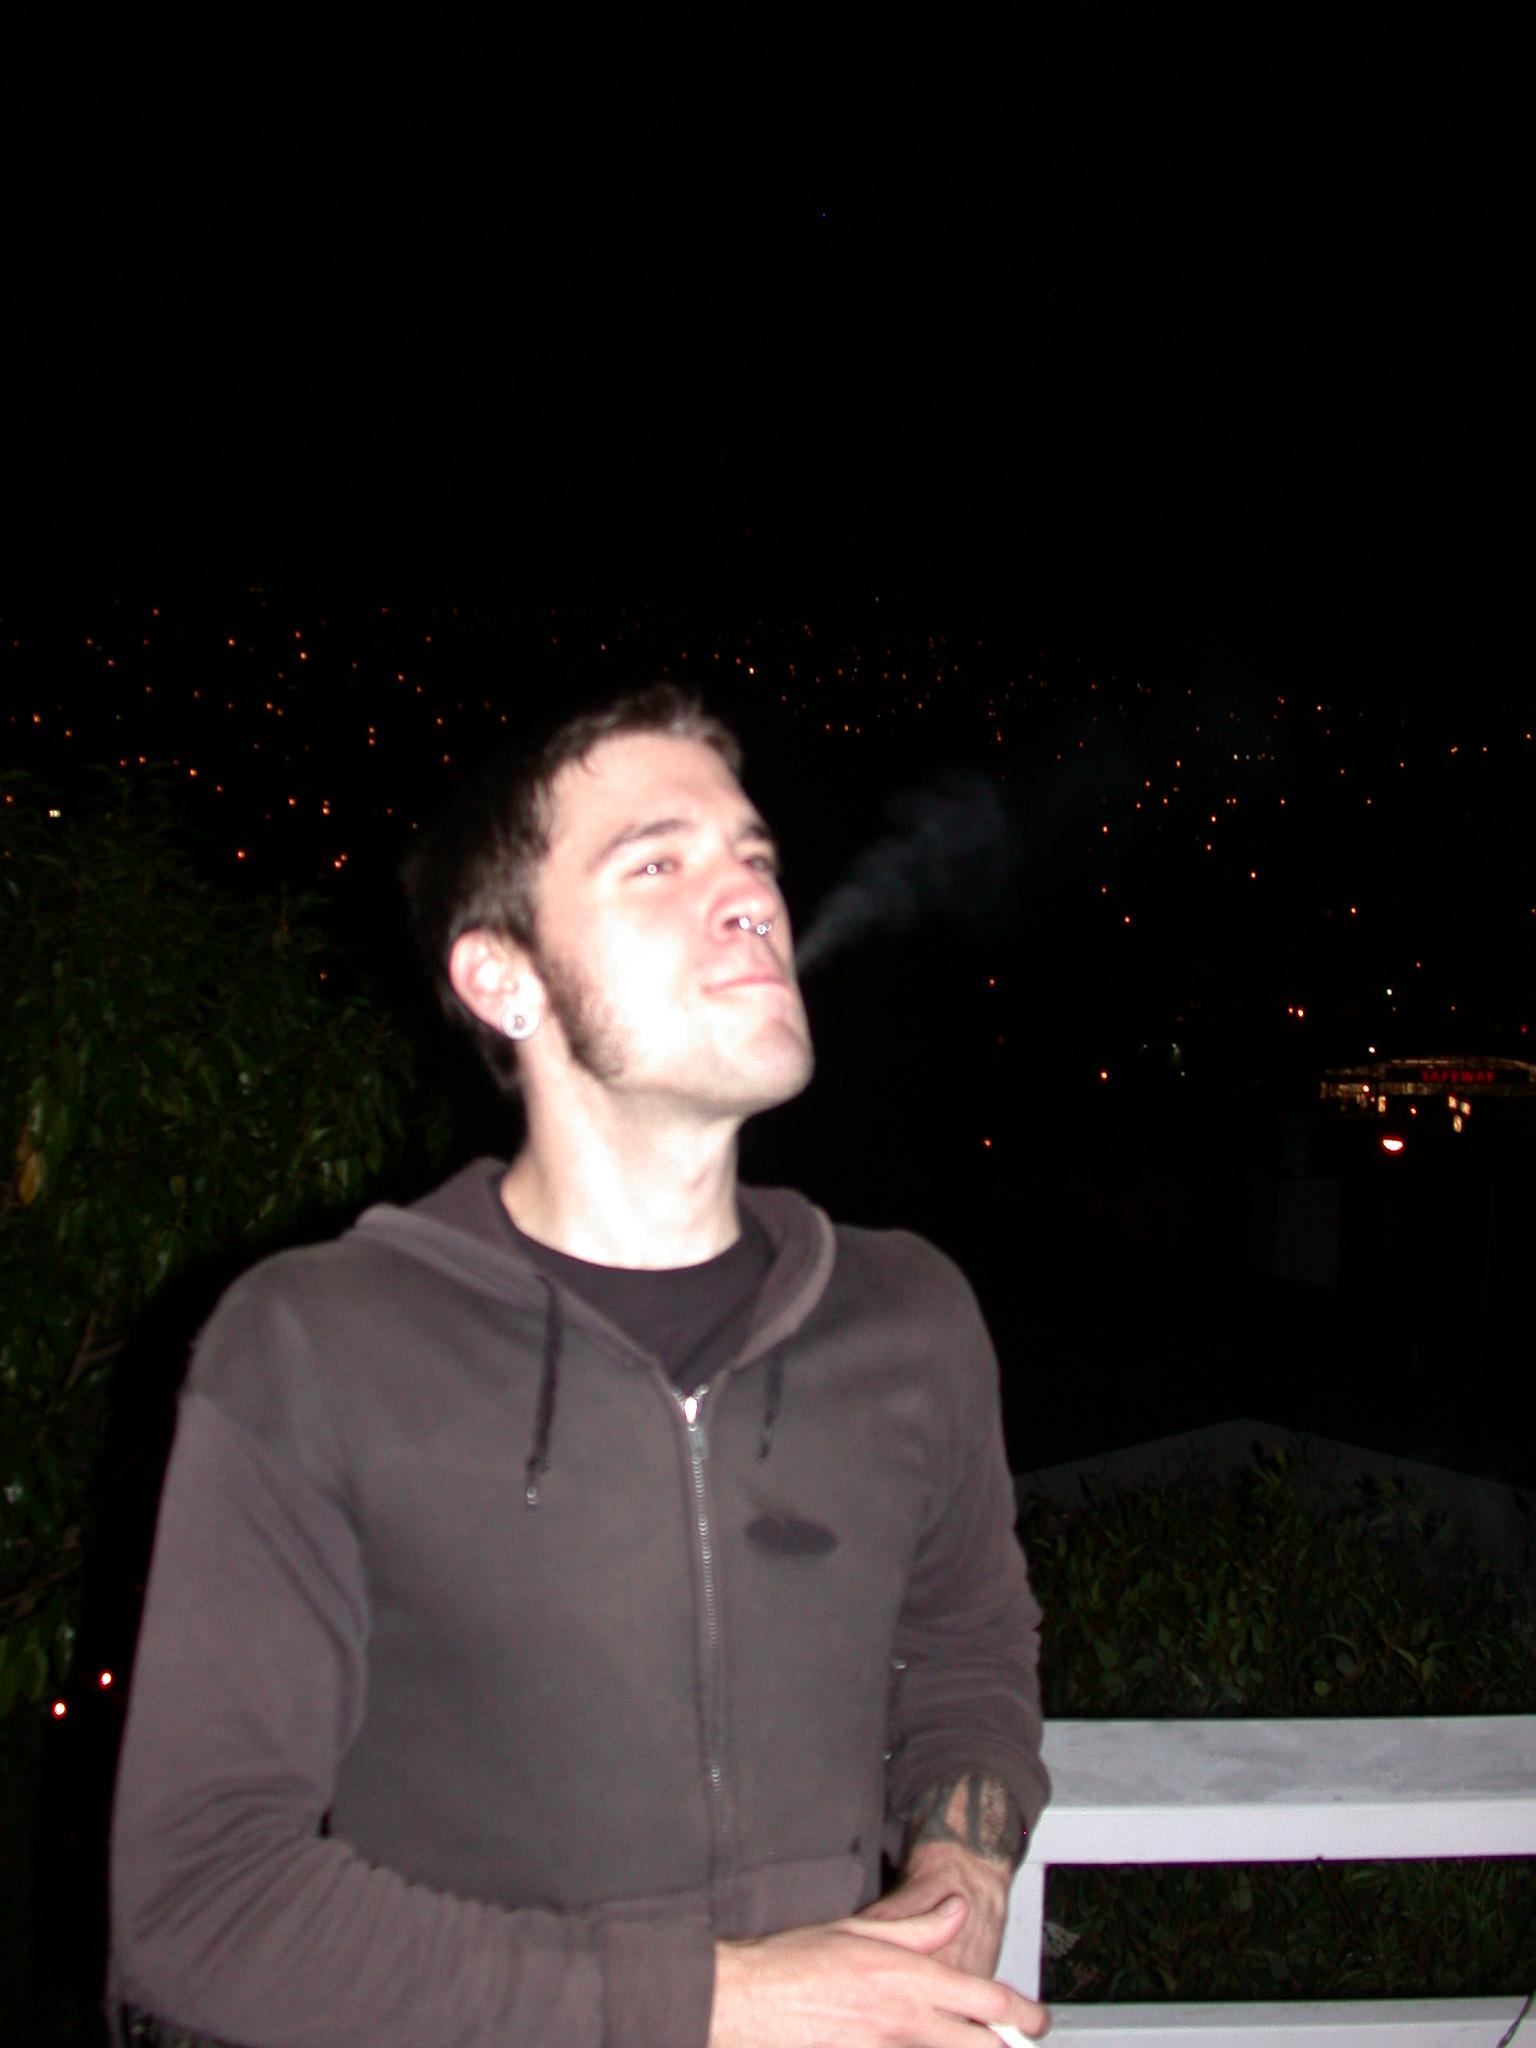 Steven Exhaling Poisonous Fumes